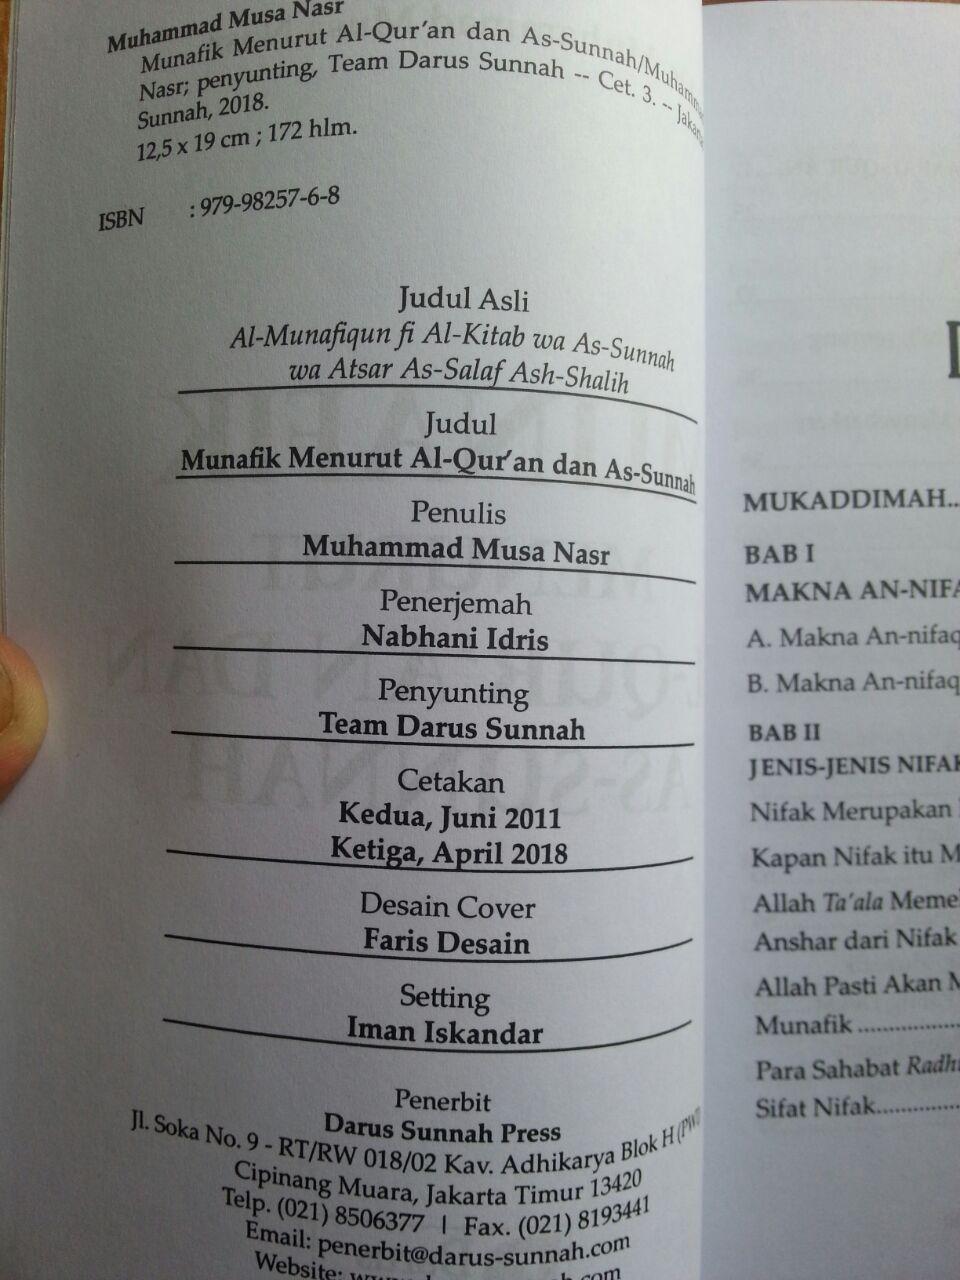 Buku Munafik Menurut Al-Quran dan As-Sunnah isi